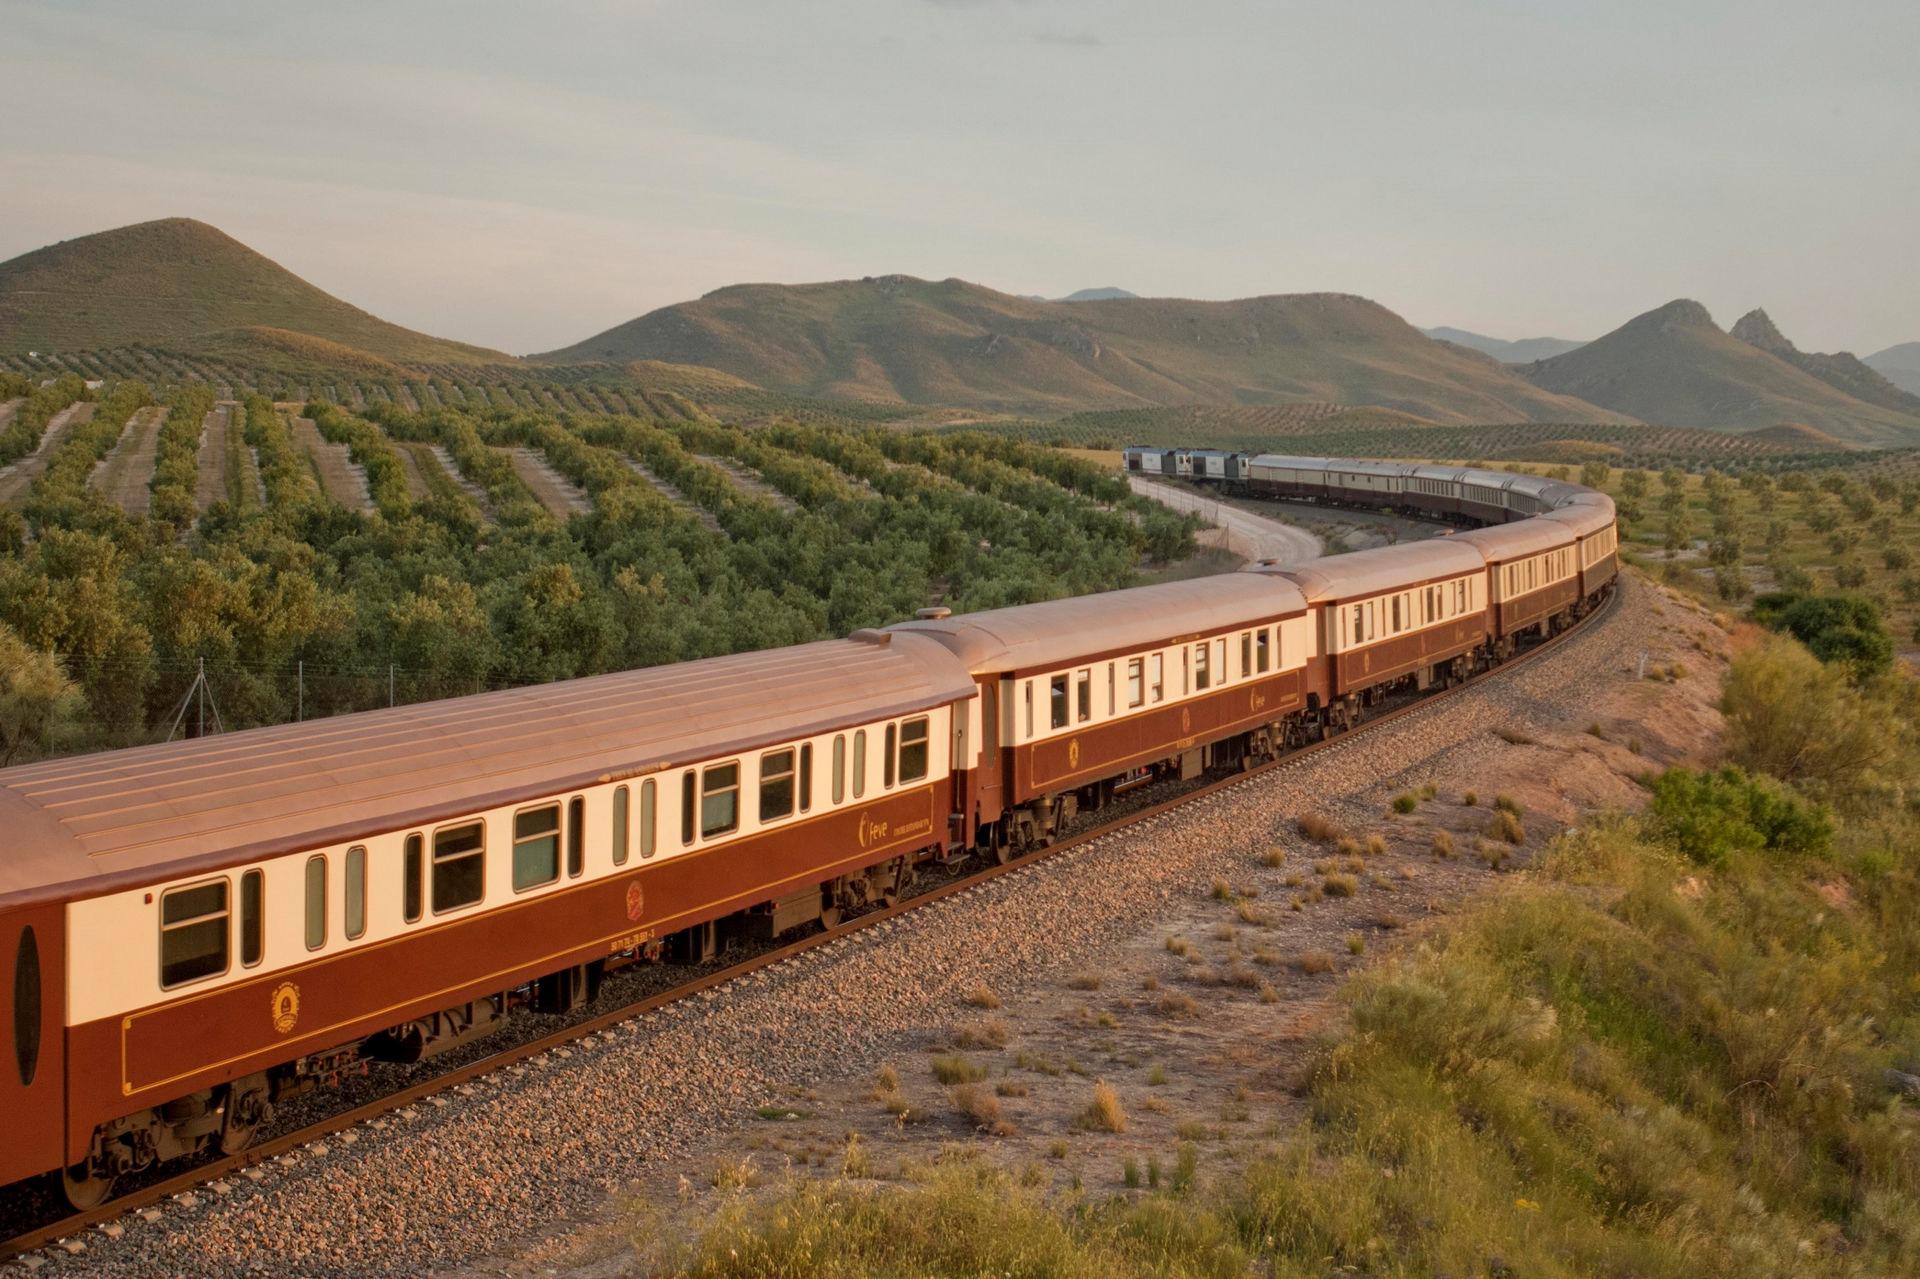 NOMAD-luksusowe-pociągi-w-Hiszpani-Al-Andalus-01